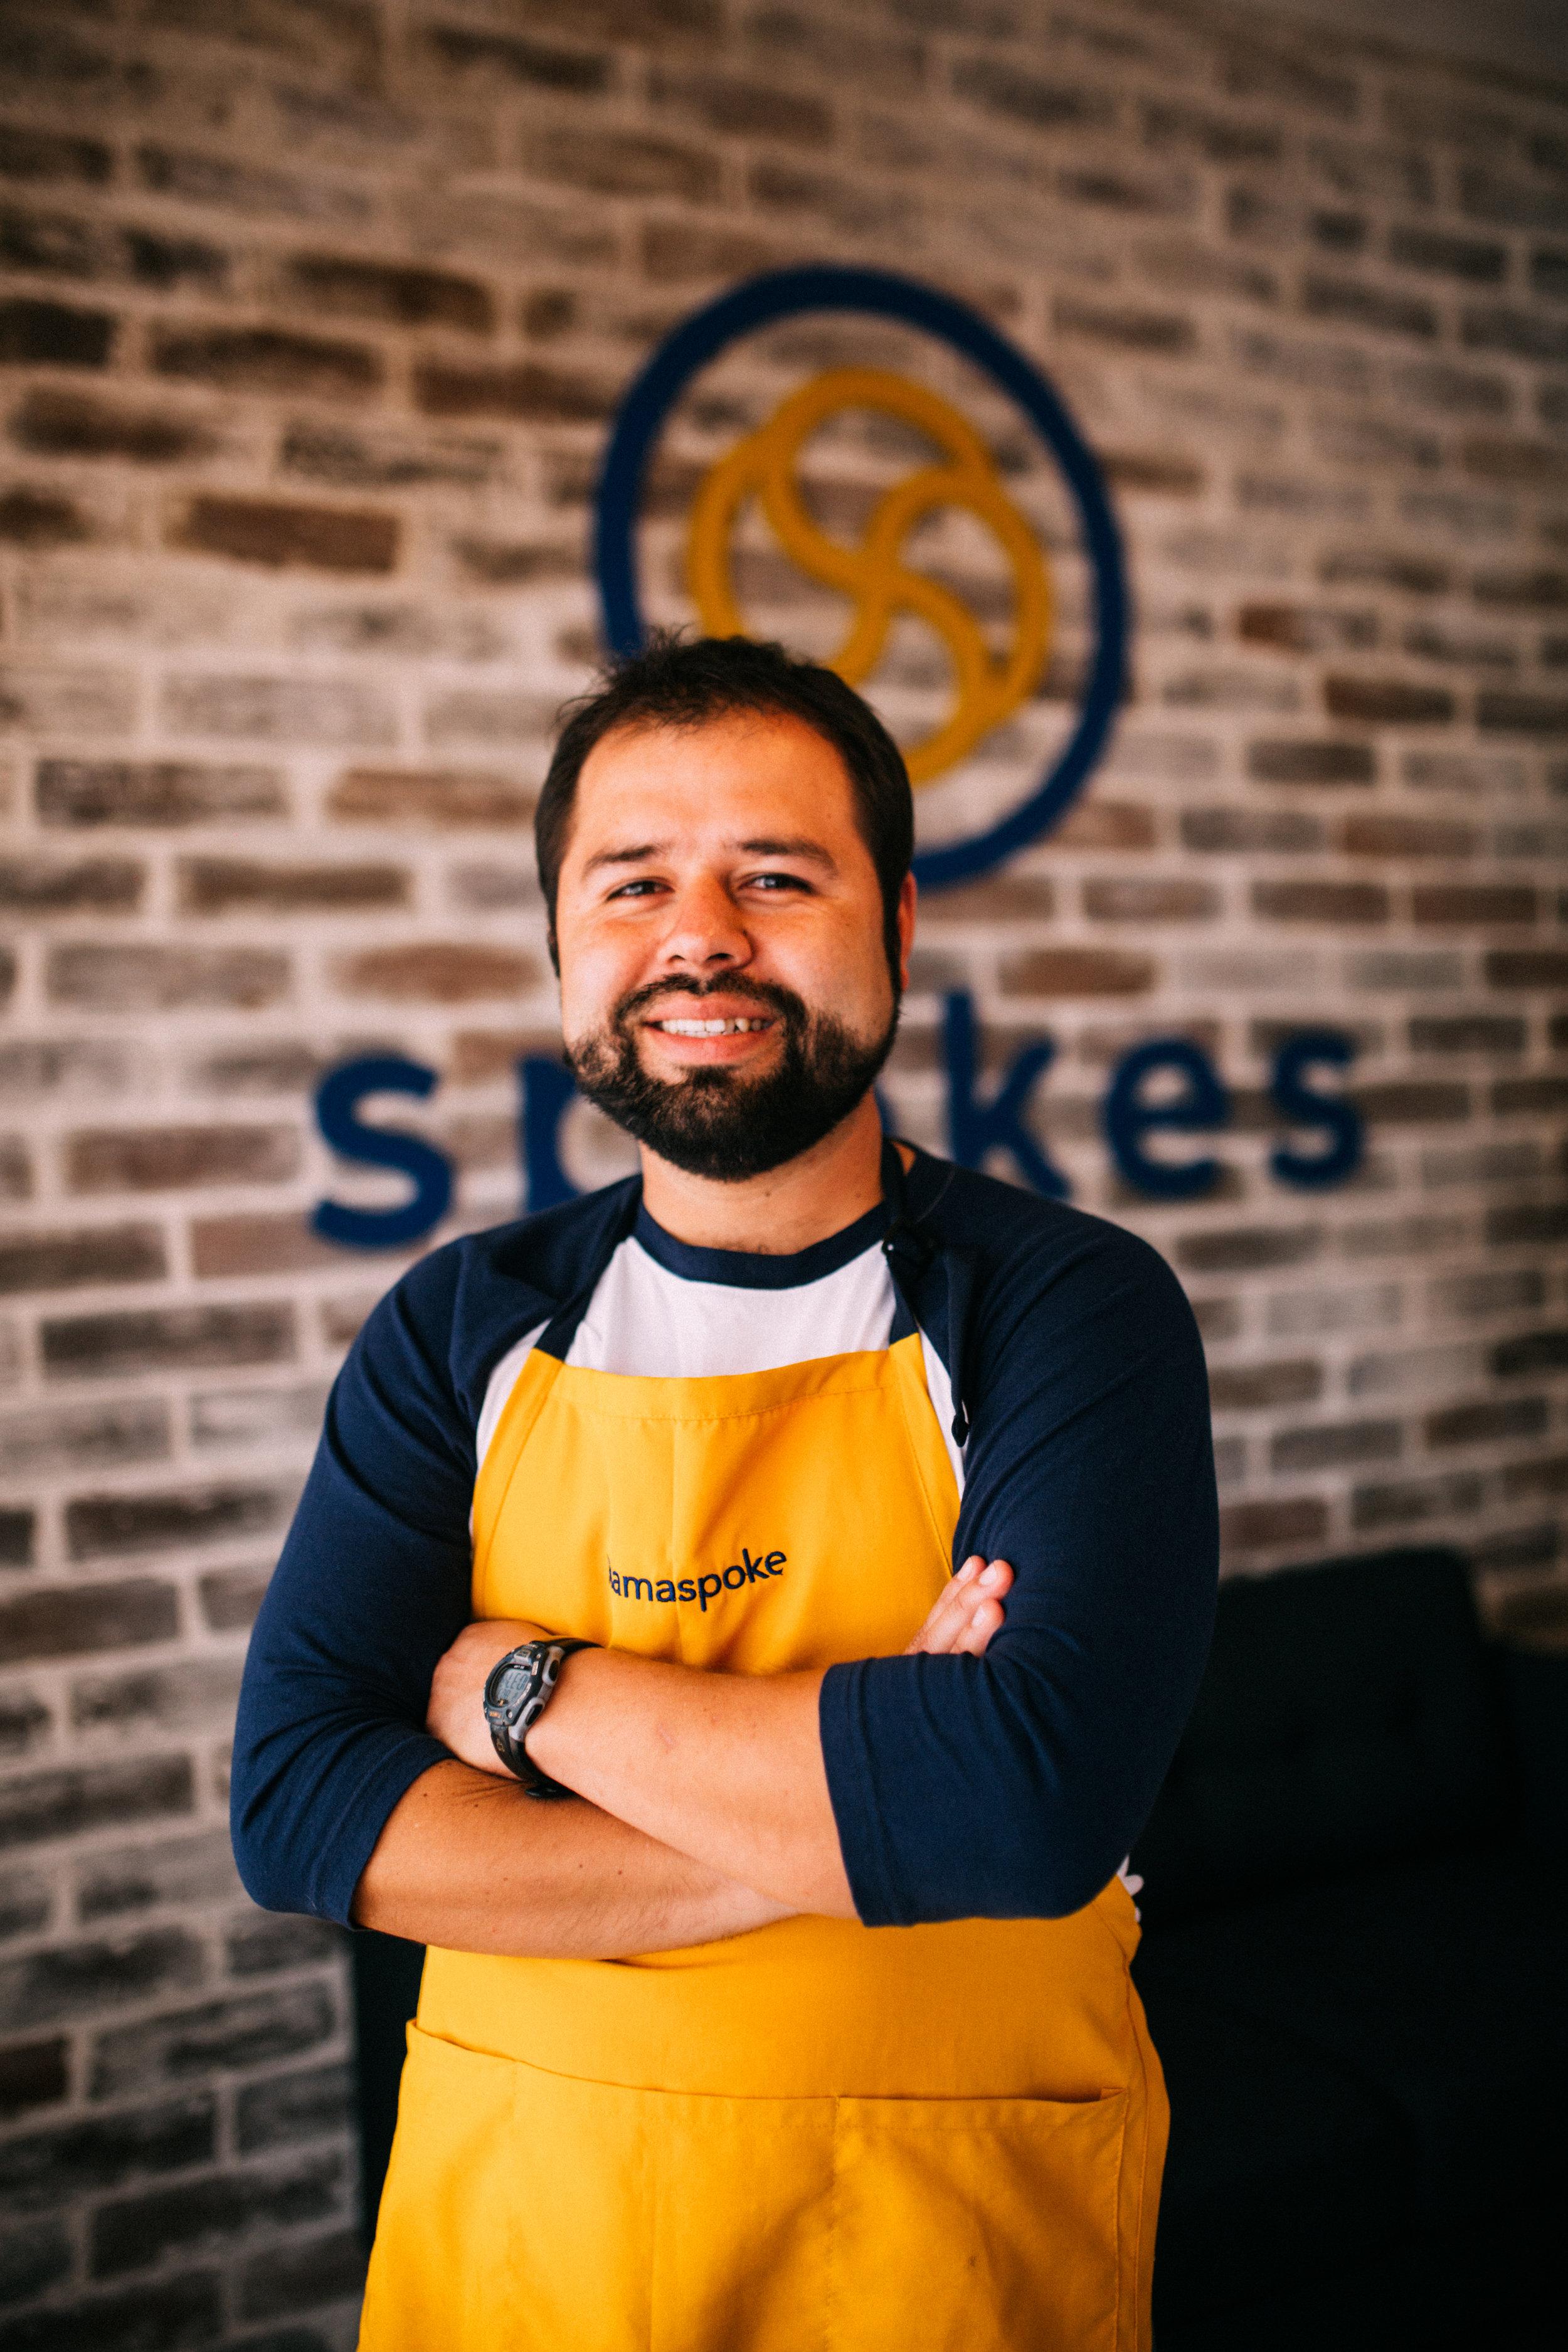 Jose Rolando Monterroso